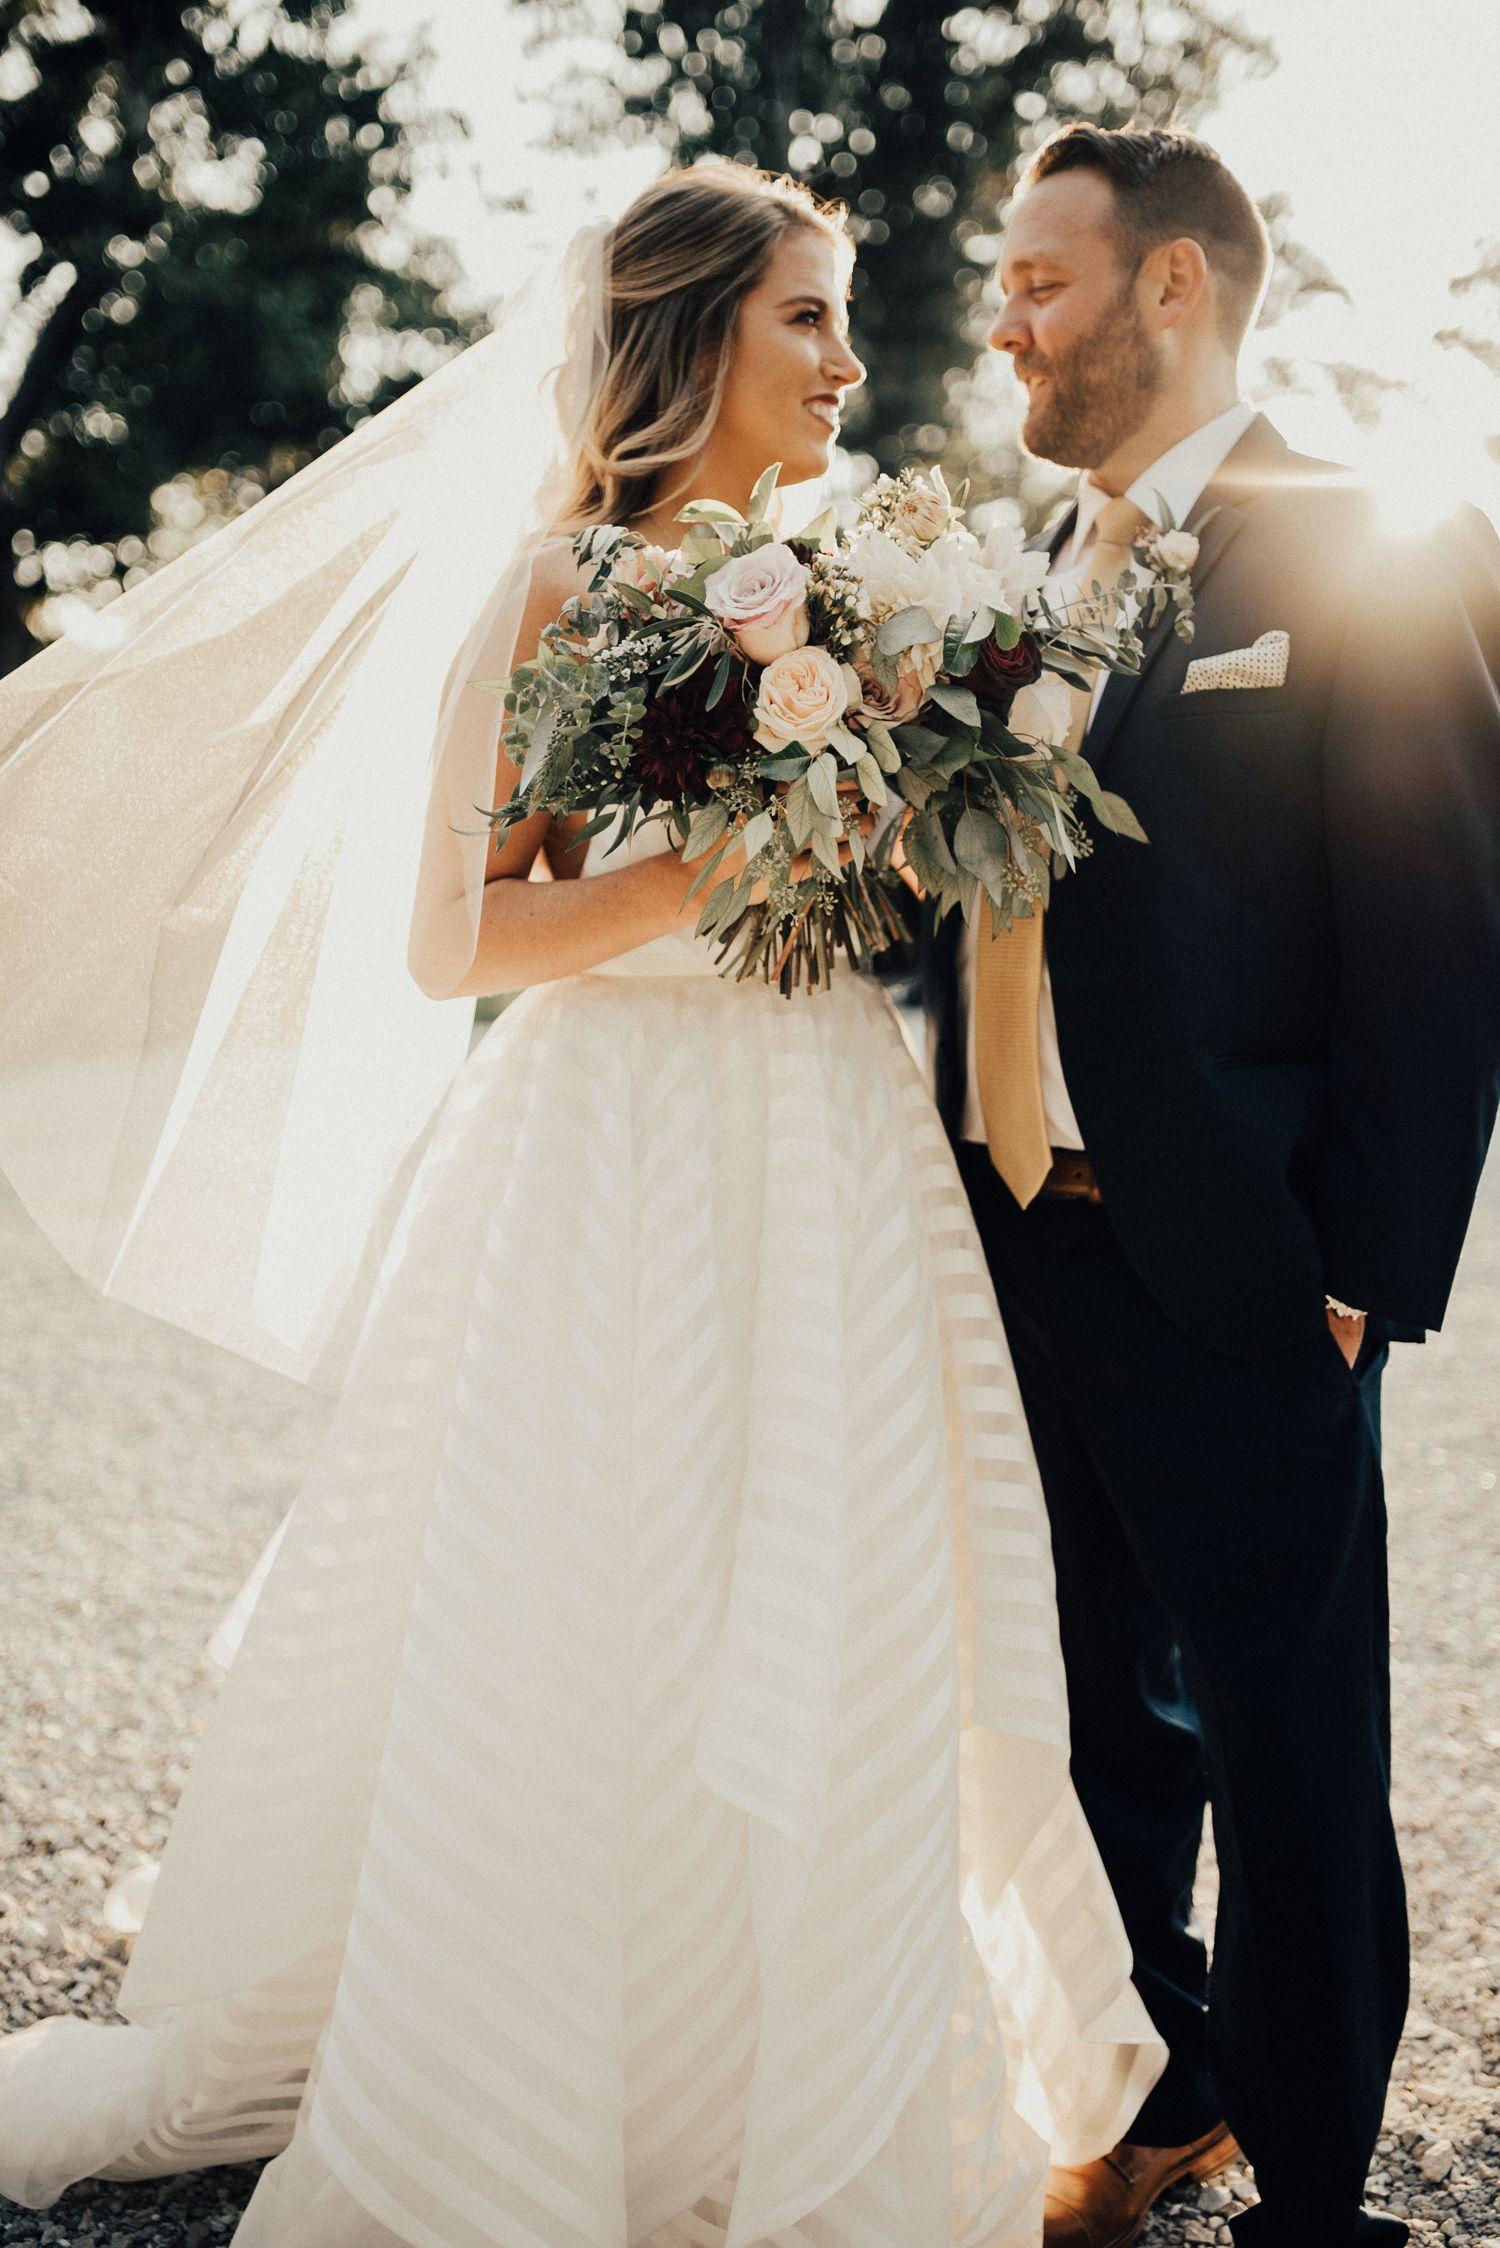 Non traditional wedding dress  striped wedding dress  St Louis wedding photographers  Silver